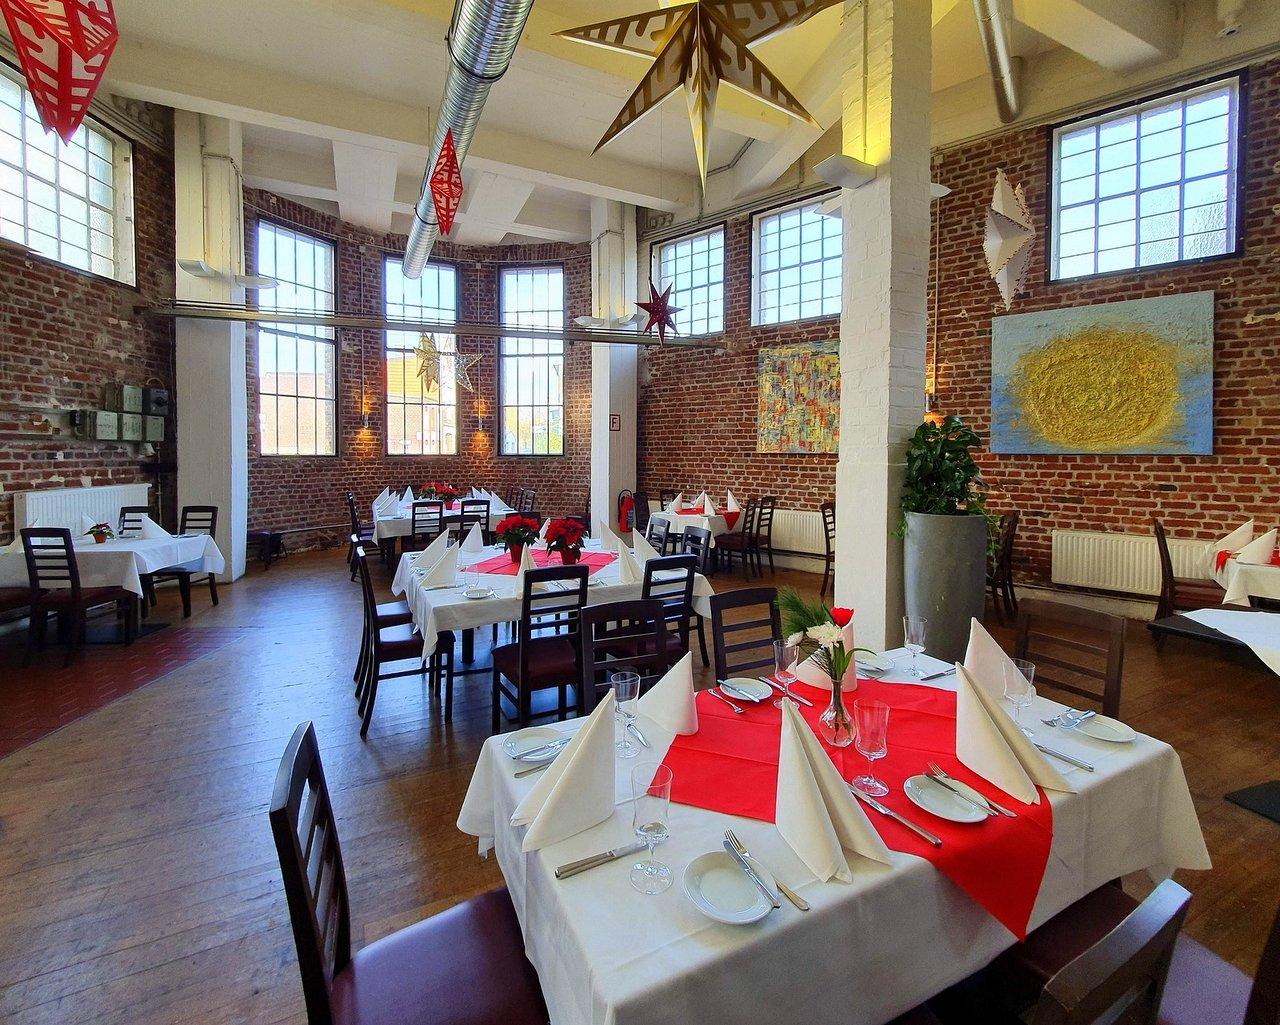 Die 10 Besten Restaurants In Krefeld 2020 Mit Bildern Tripadvisor